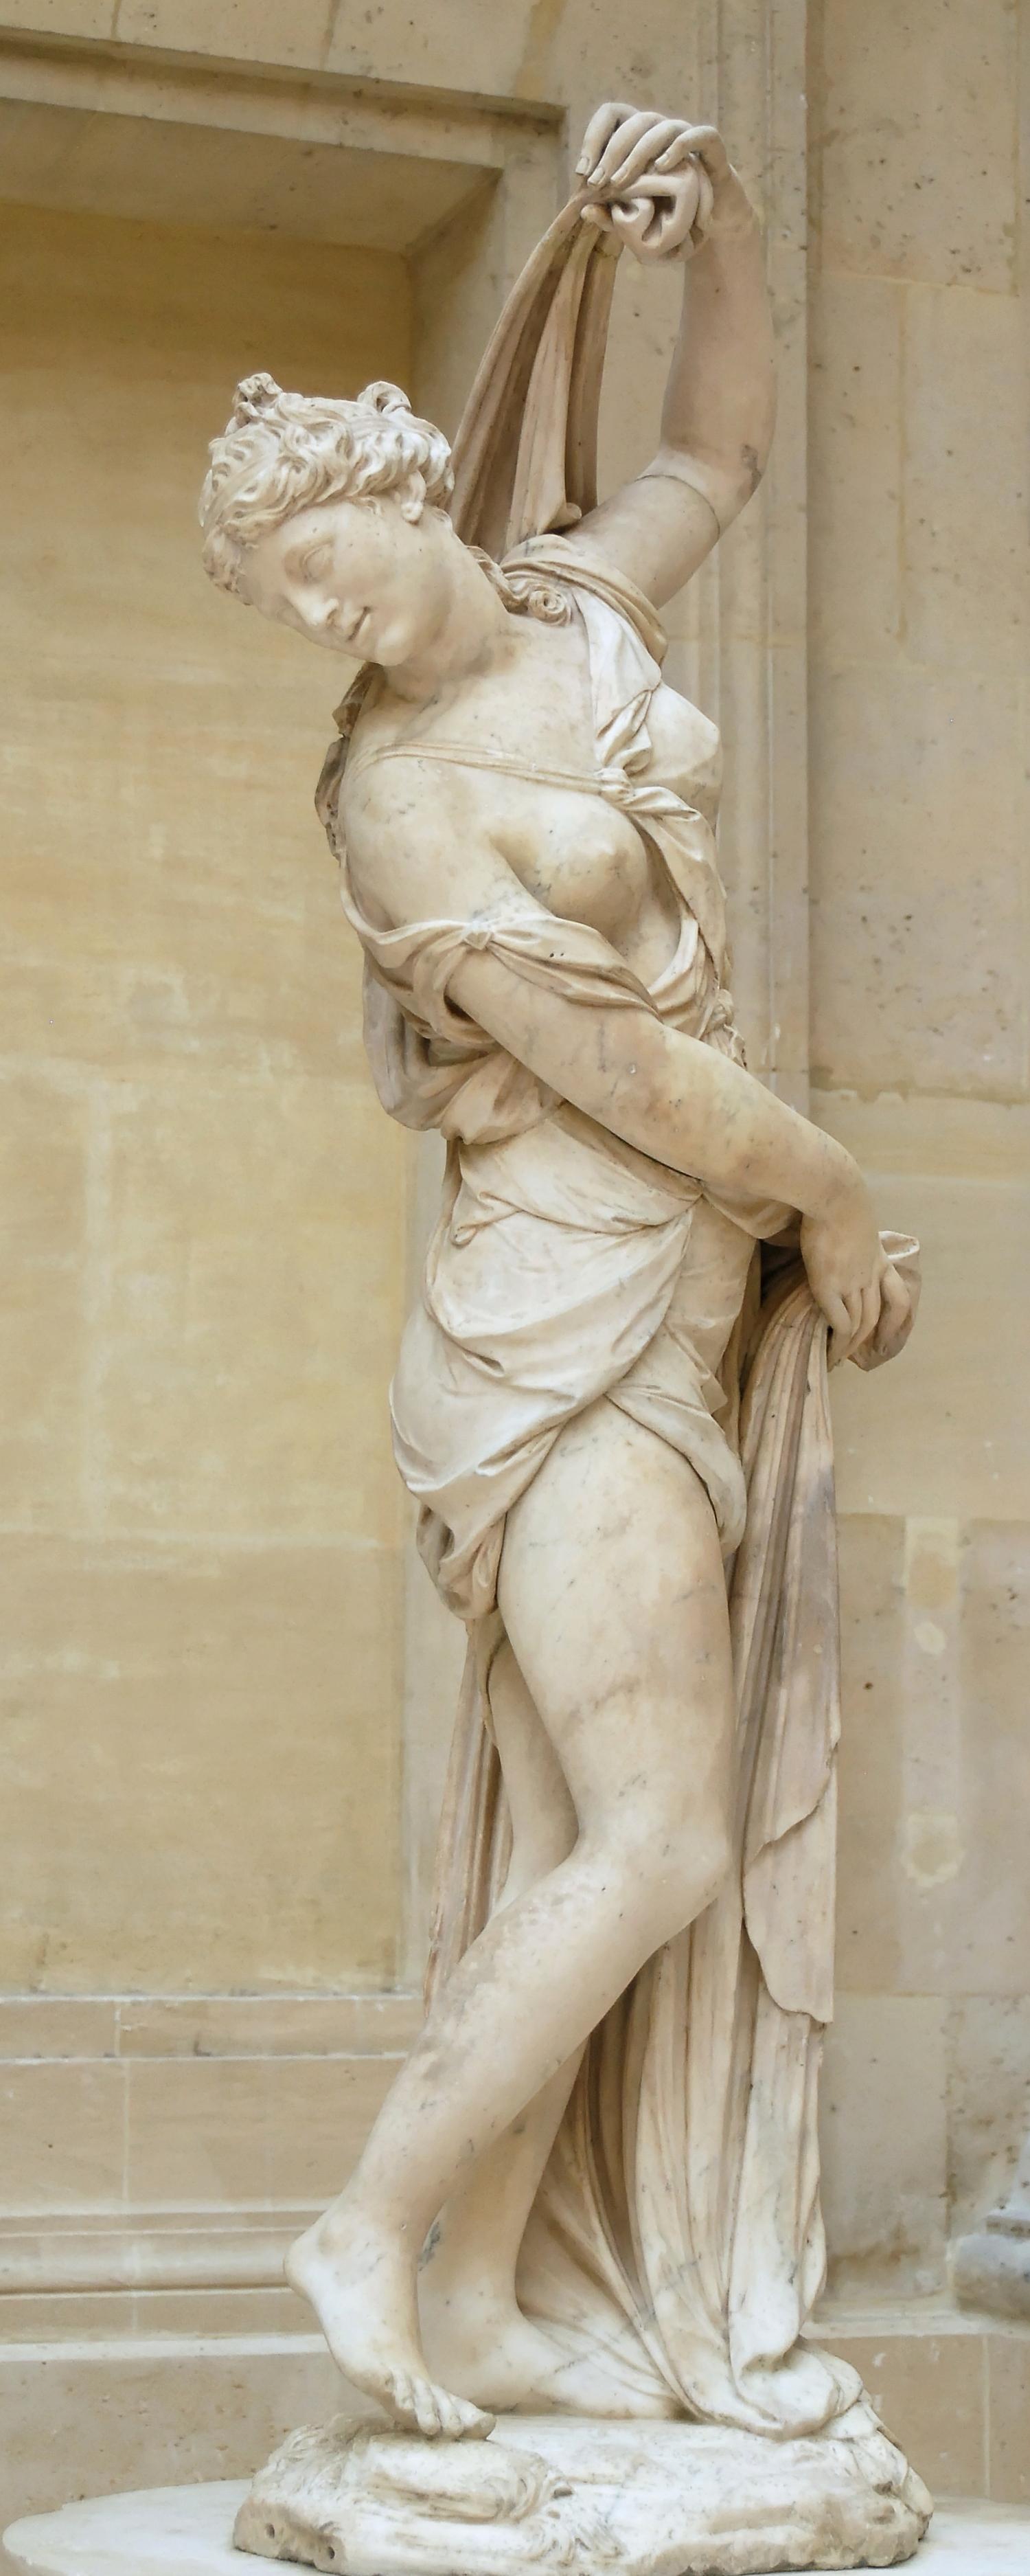 La magia de la historia Muggle [OFICIAL] Callipygian_Venus_Barois_Louvre_MR1999_n2